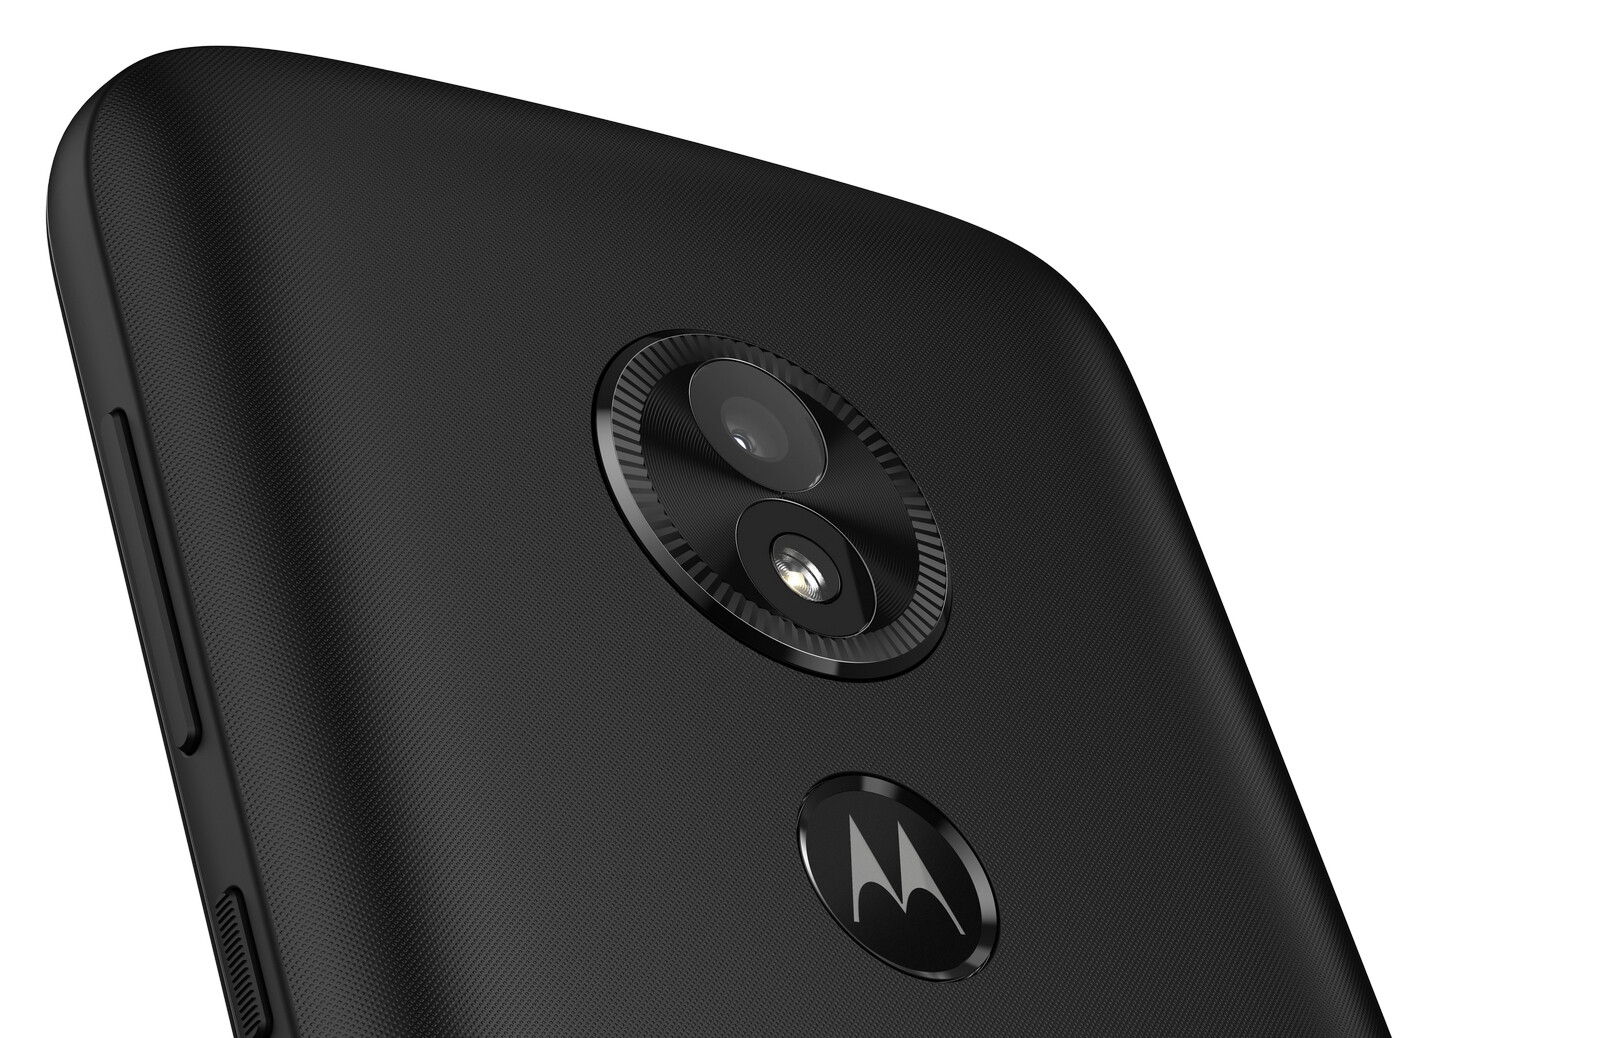 The Moto E5 Play and Moto E5 Plus are Motorola's cool new